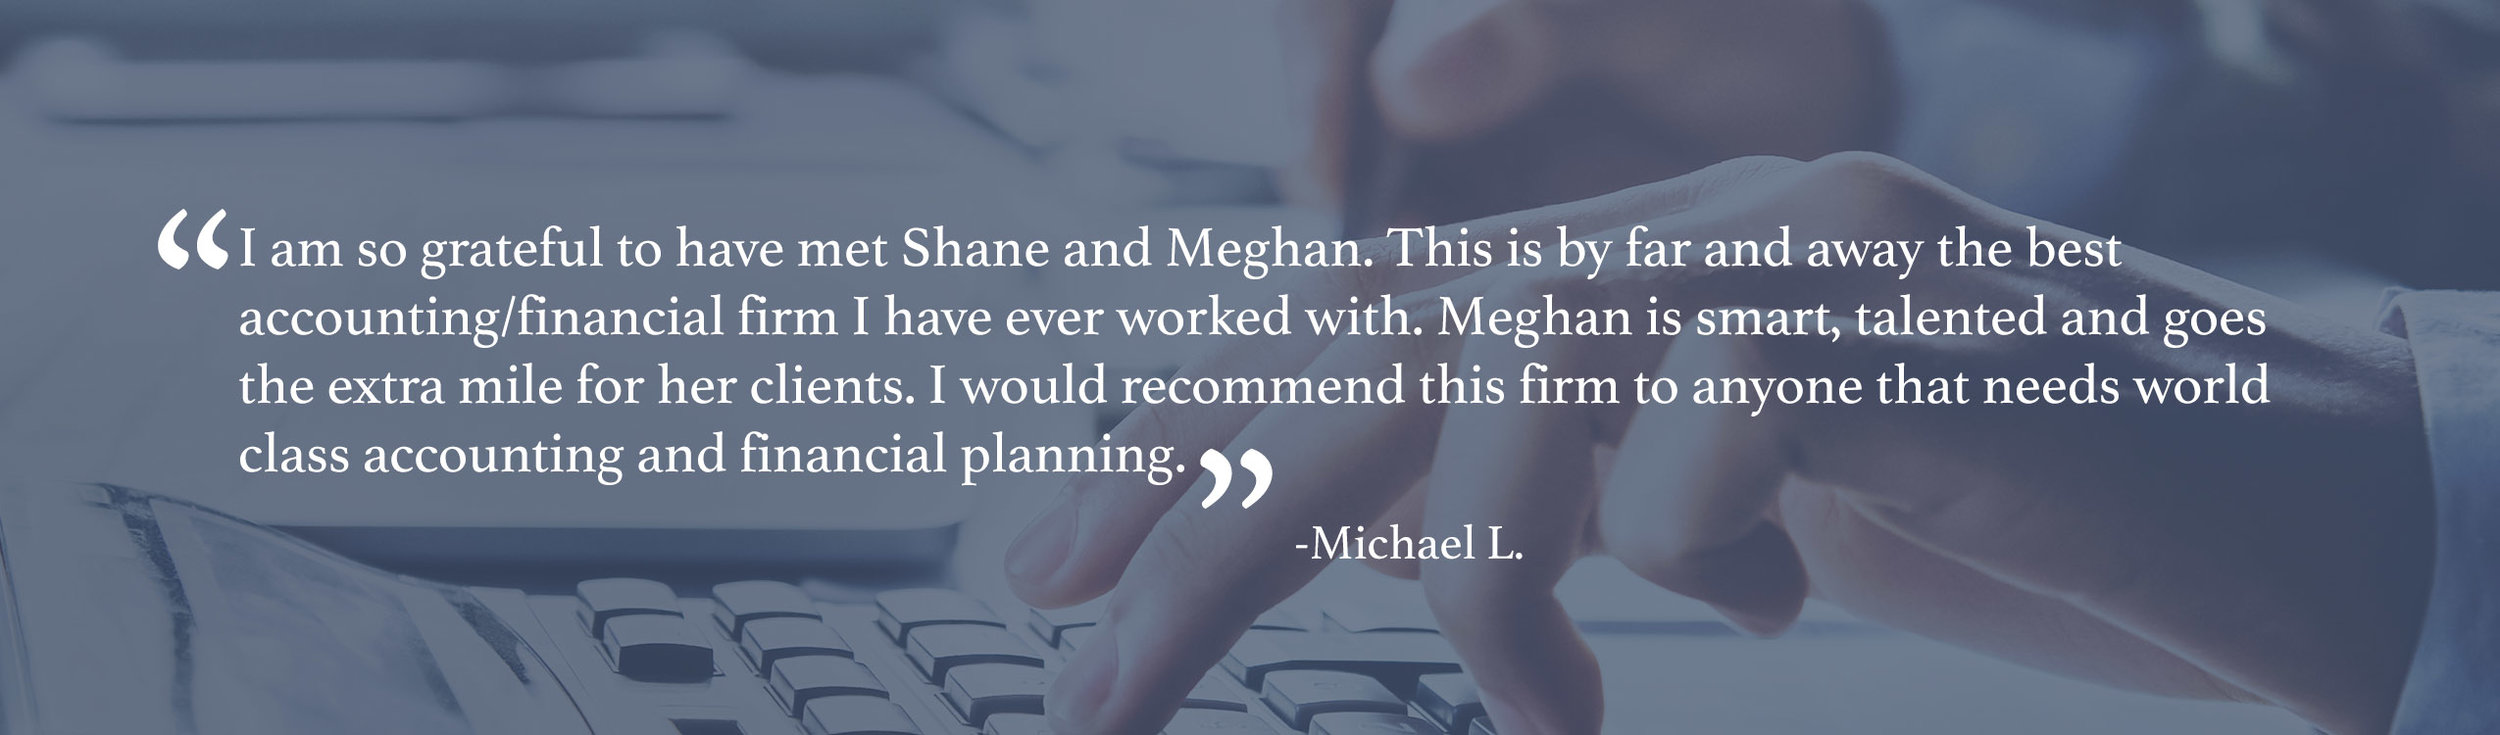 Michael L Testimonial.jpg